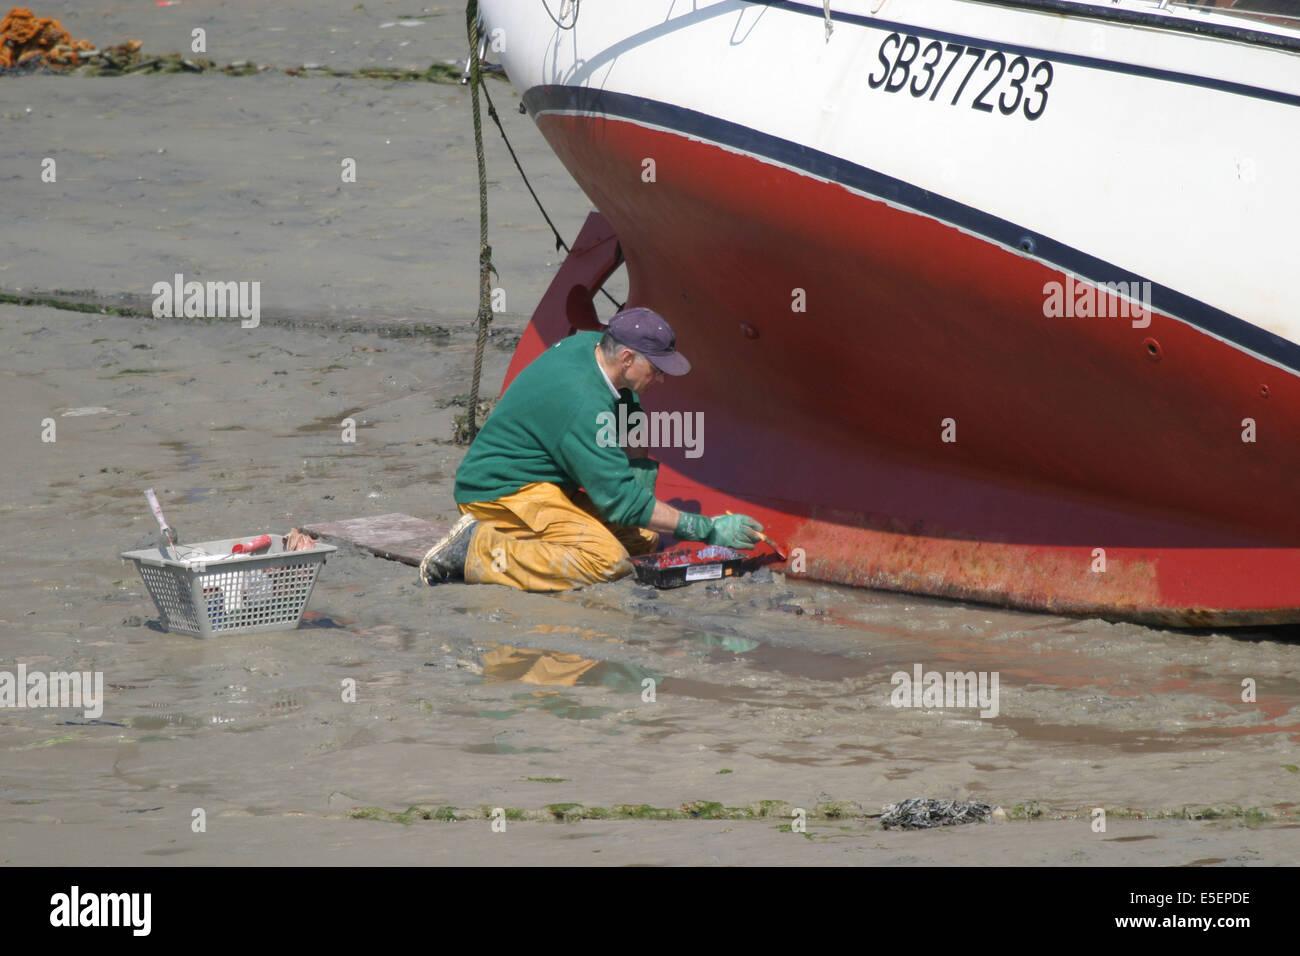 Chou stock photos chou stock images alamy - Port de peche cote d armor ...